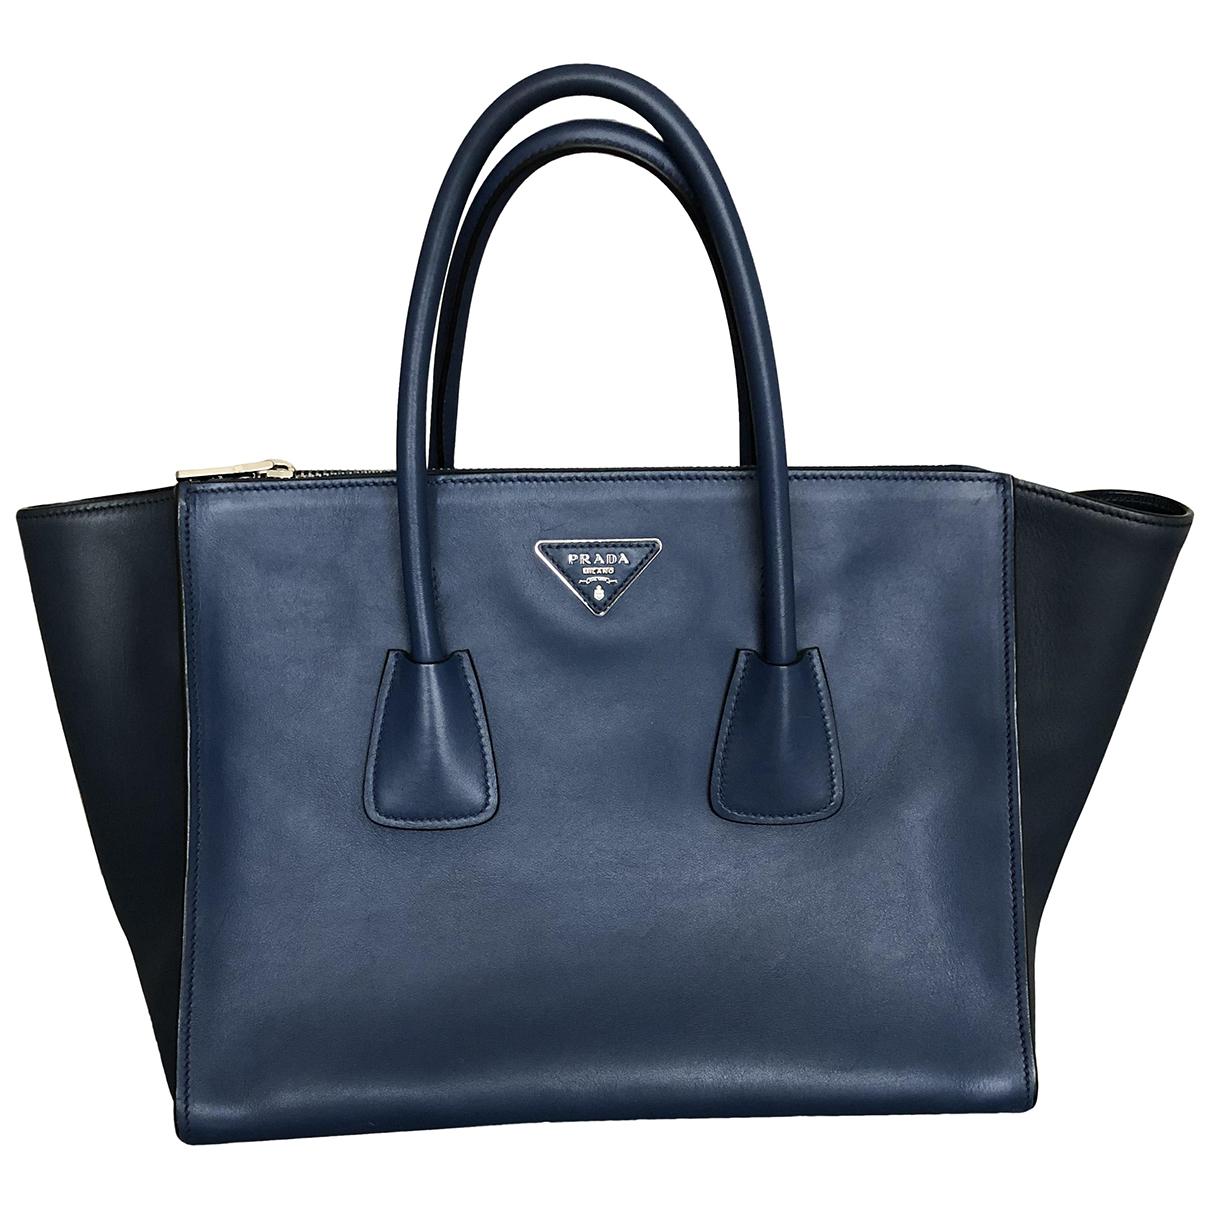 Prada N Blue Leather handbag for Women N